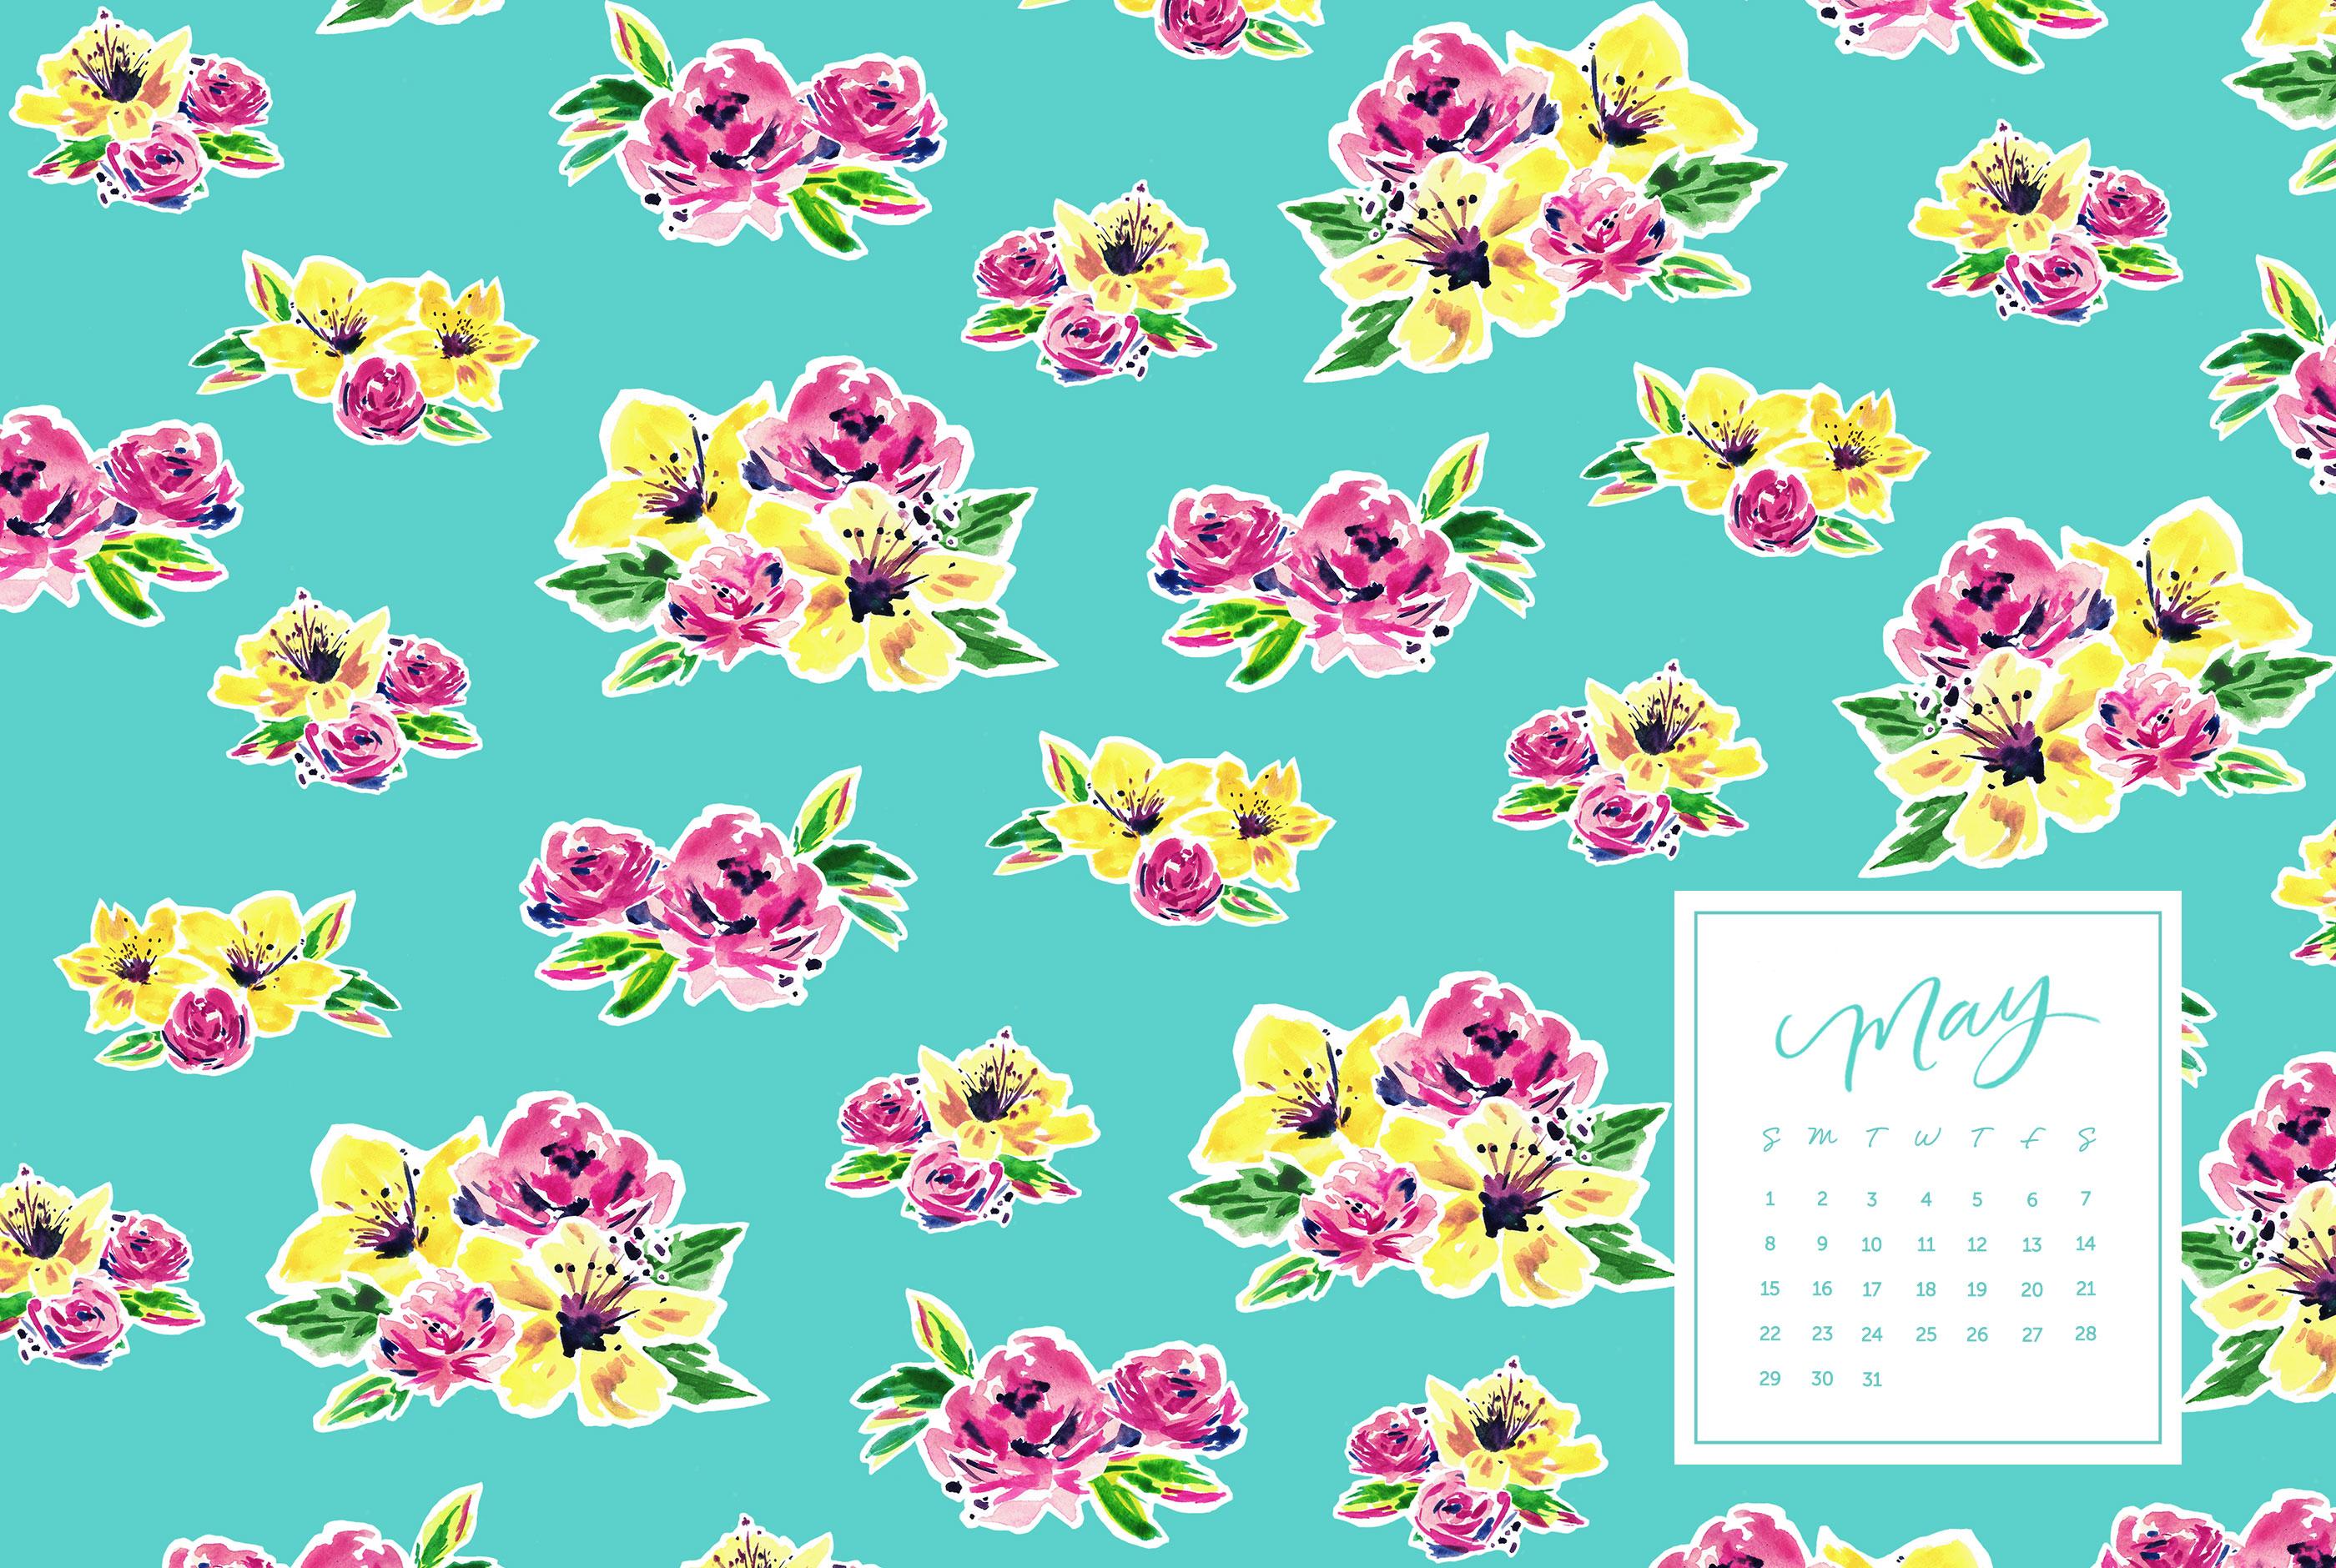 May Calendar Desktop : Floral desktop calendar craftbnb